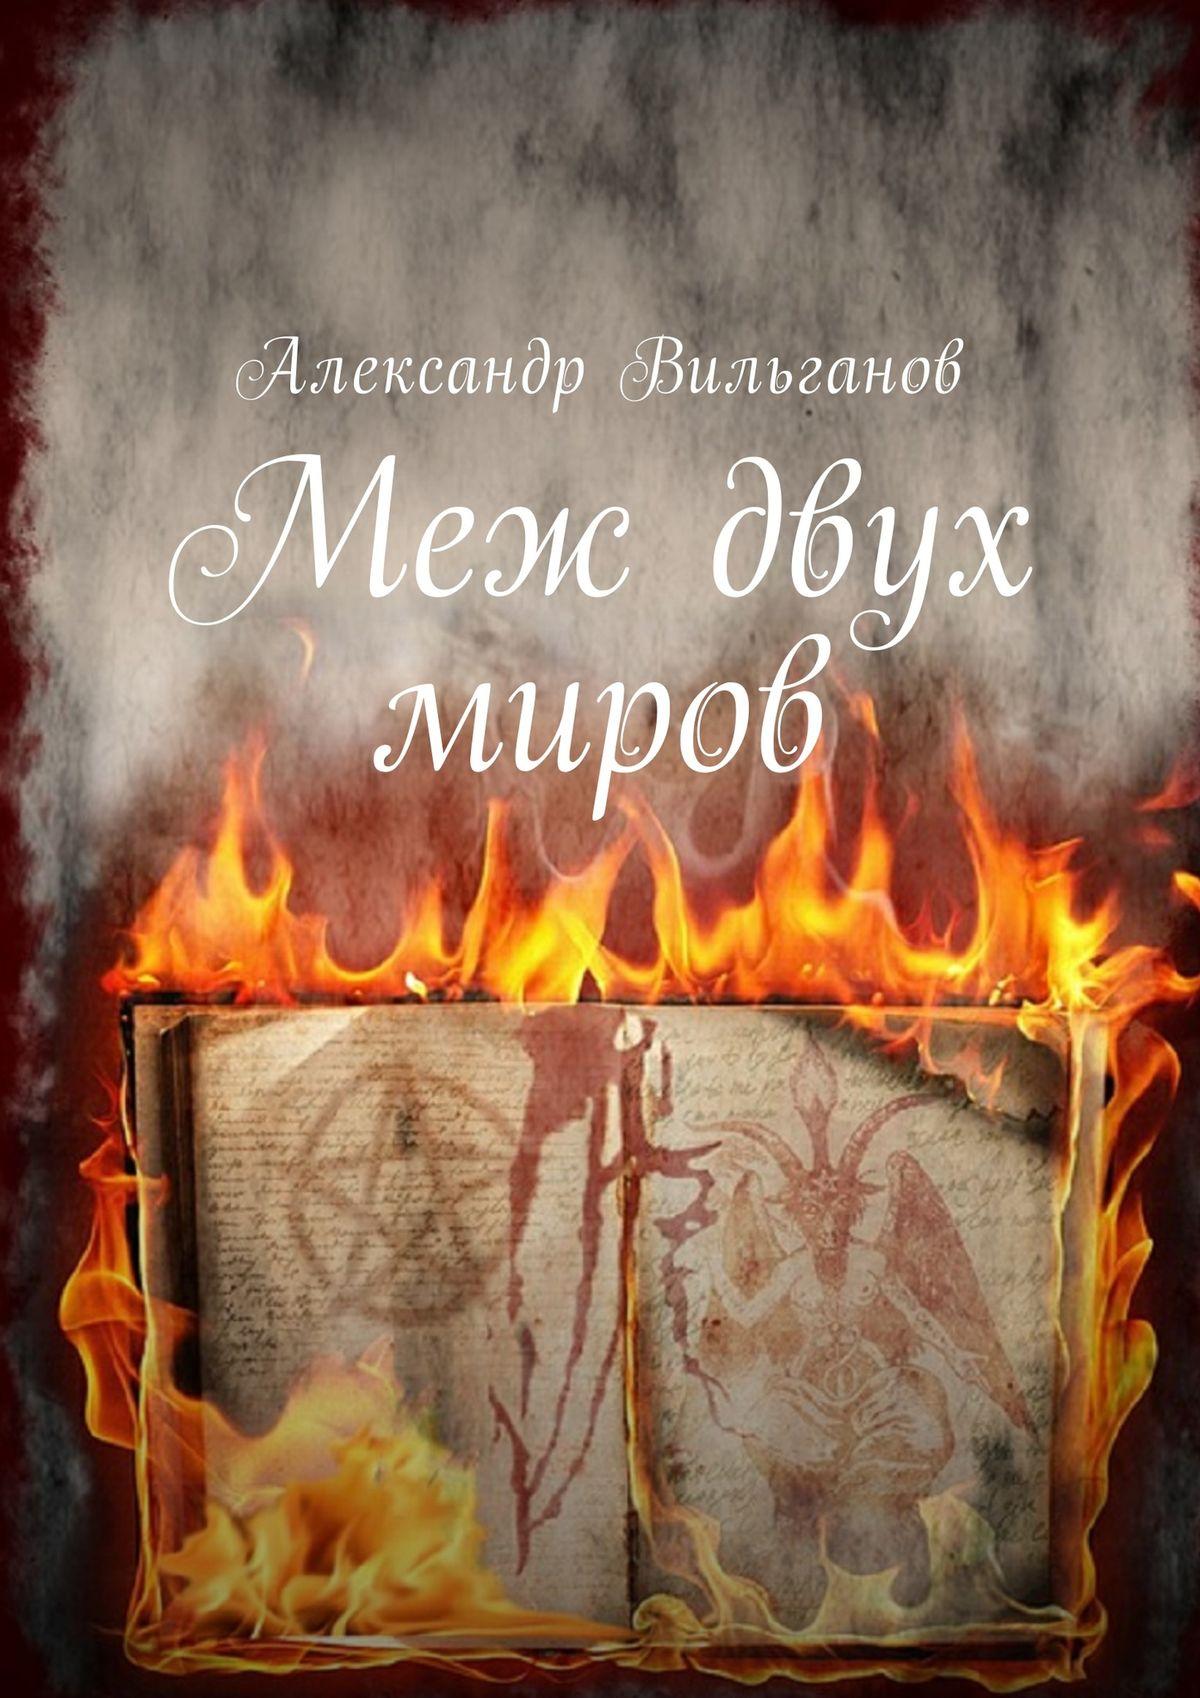 Александр Сергеевич Вильганов Меж двух миров цена